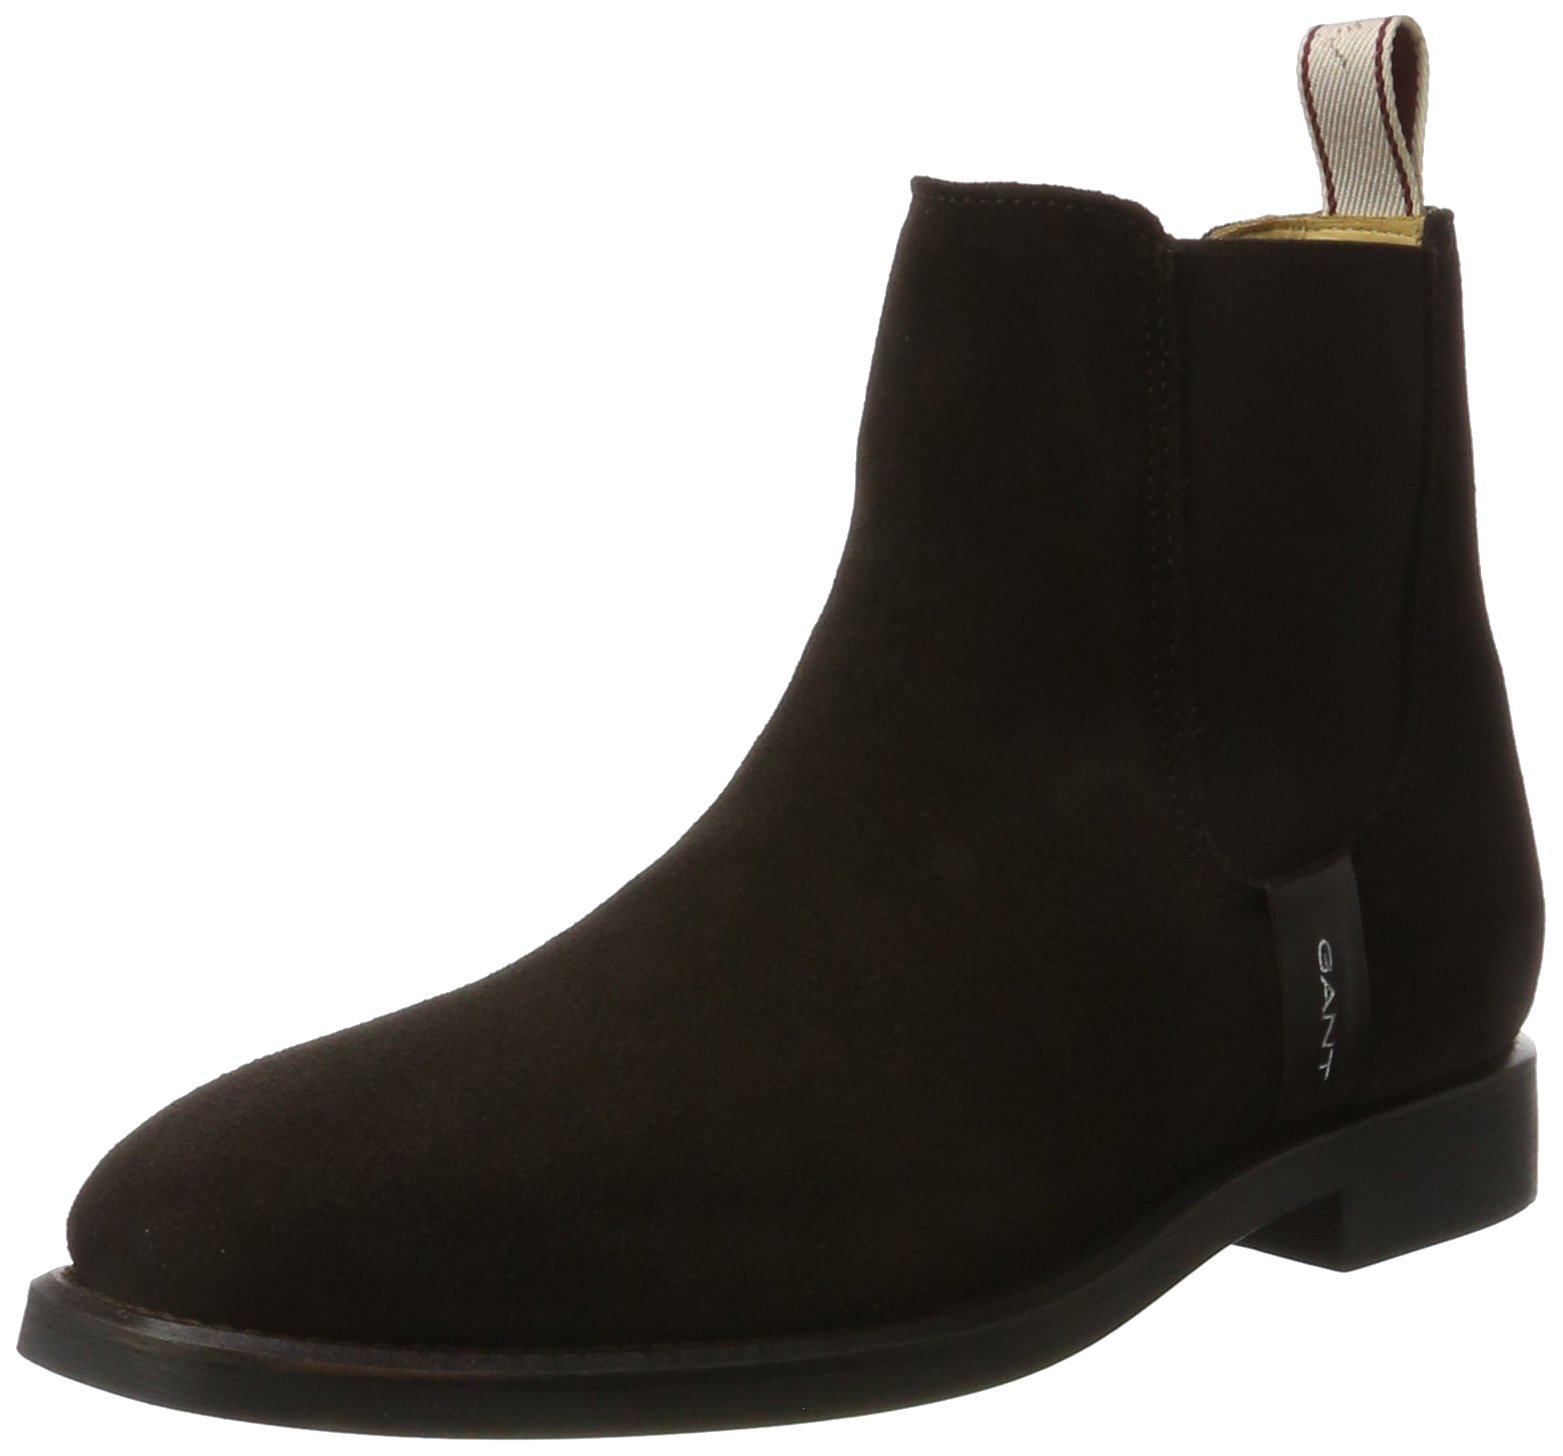 FemmeMarrondark Brown Eu JenniferChelsea Boots Gant G4638 VqUzpMS